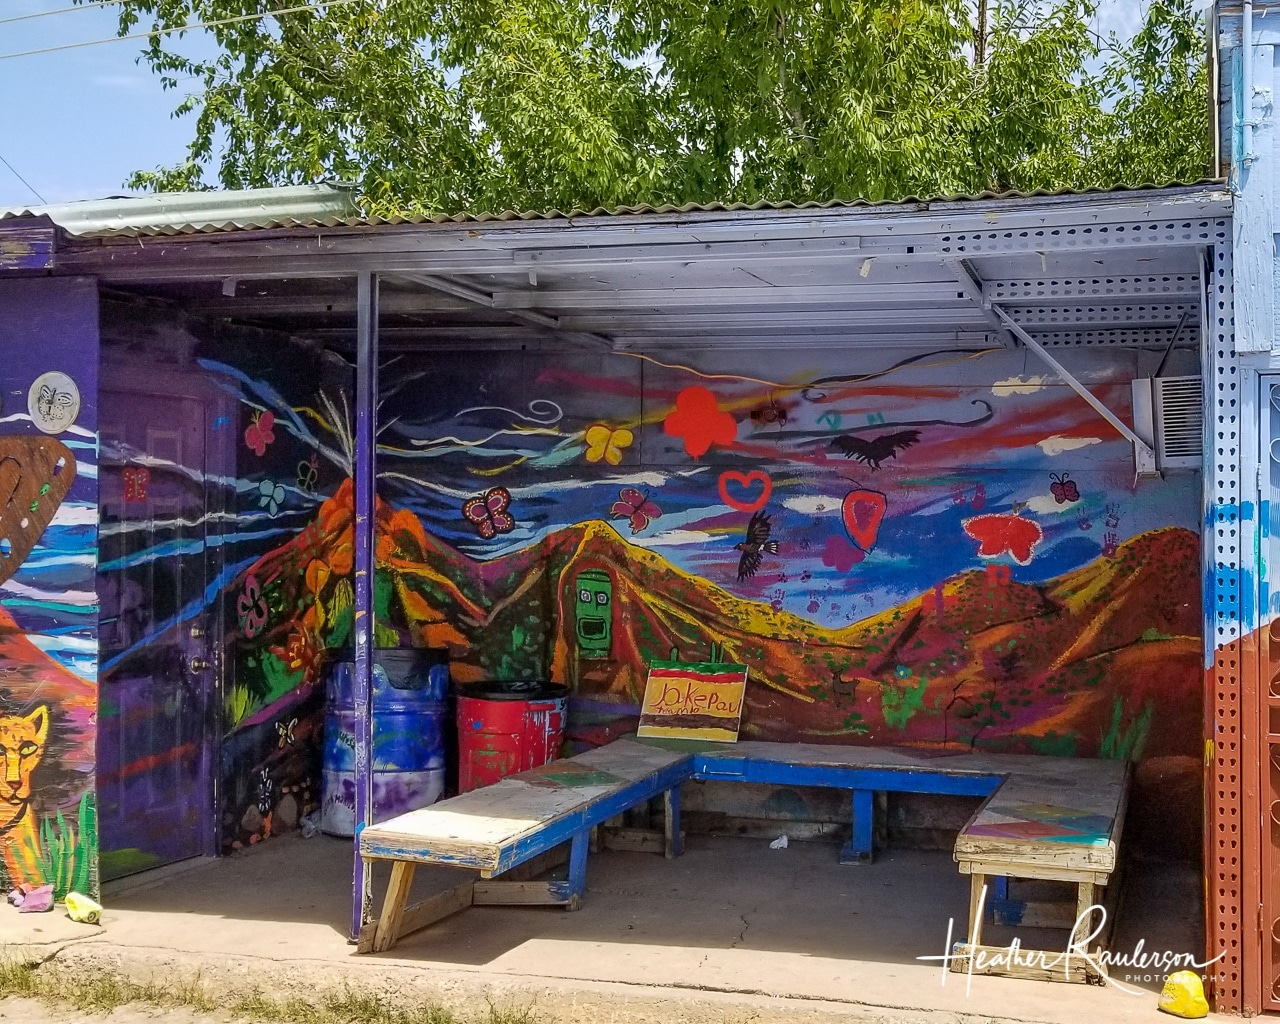 Volcano street art alcove in Naco, Mexico